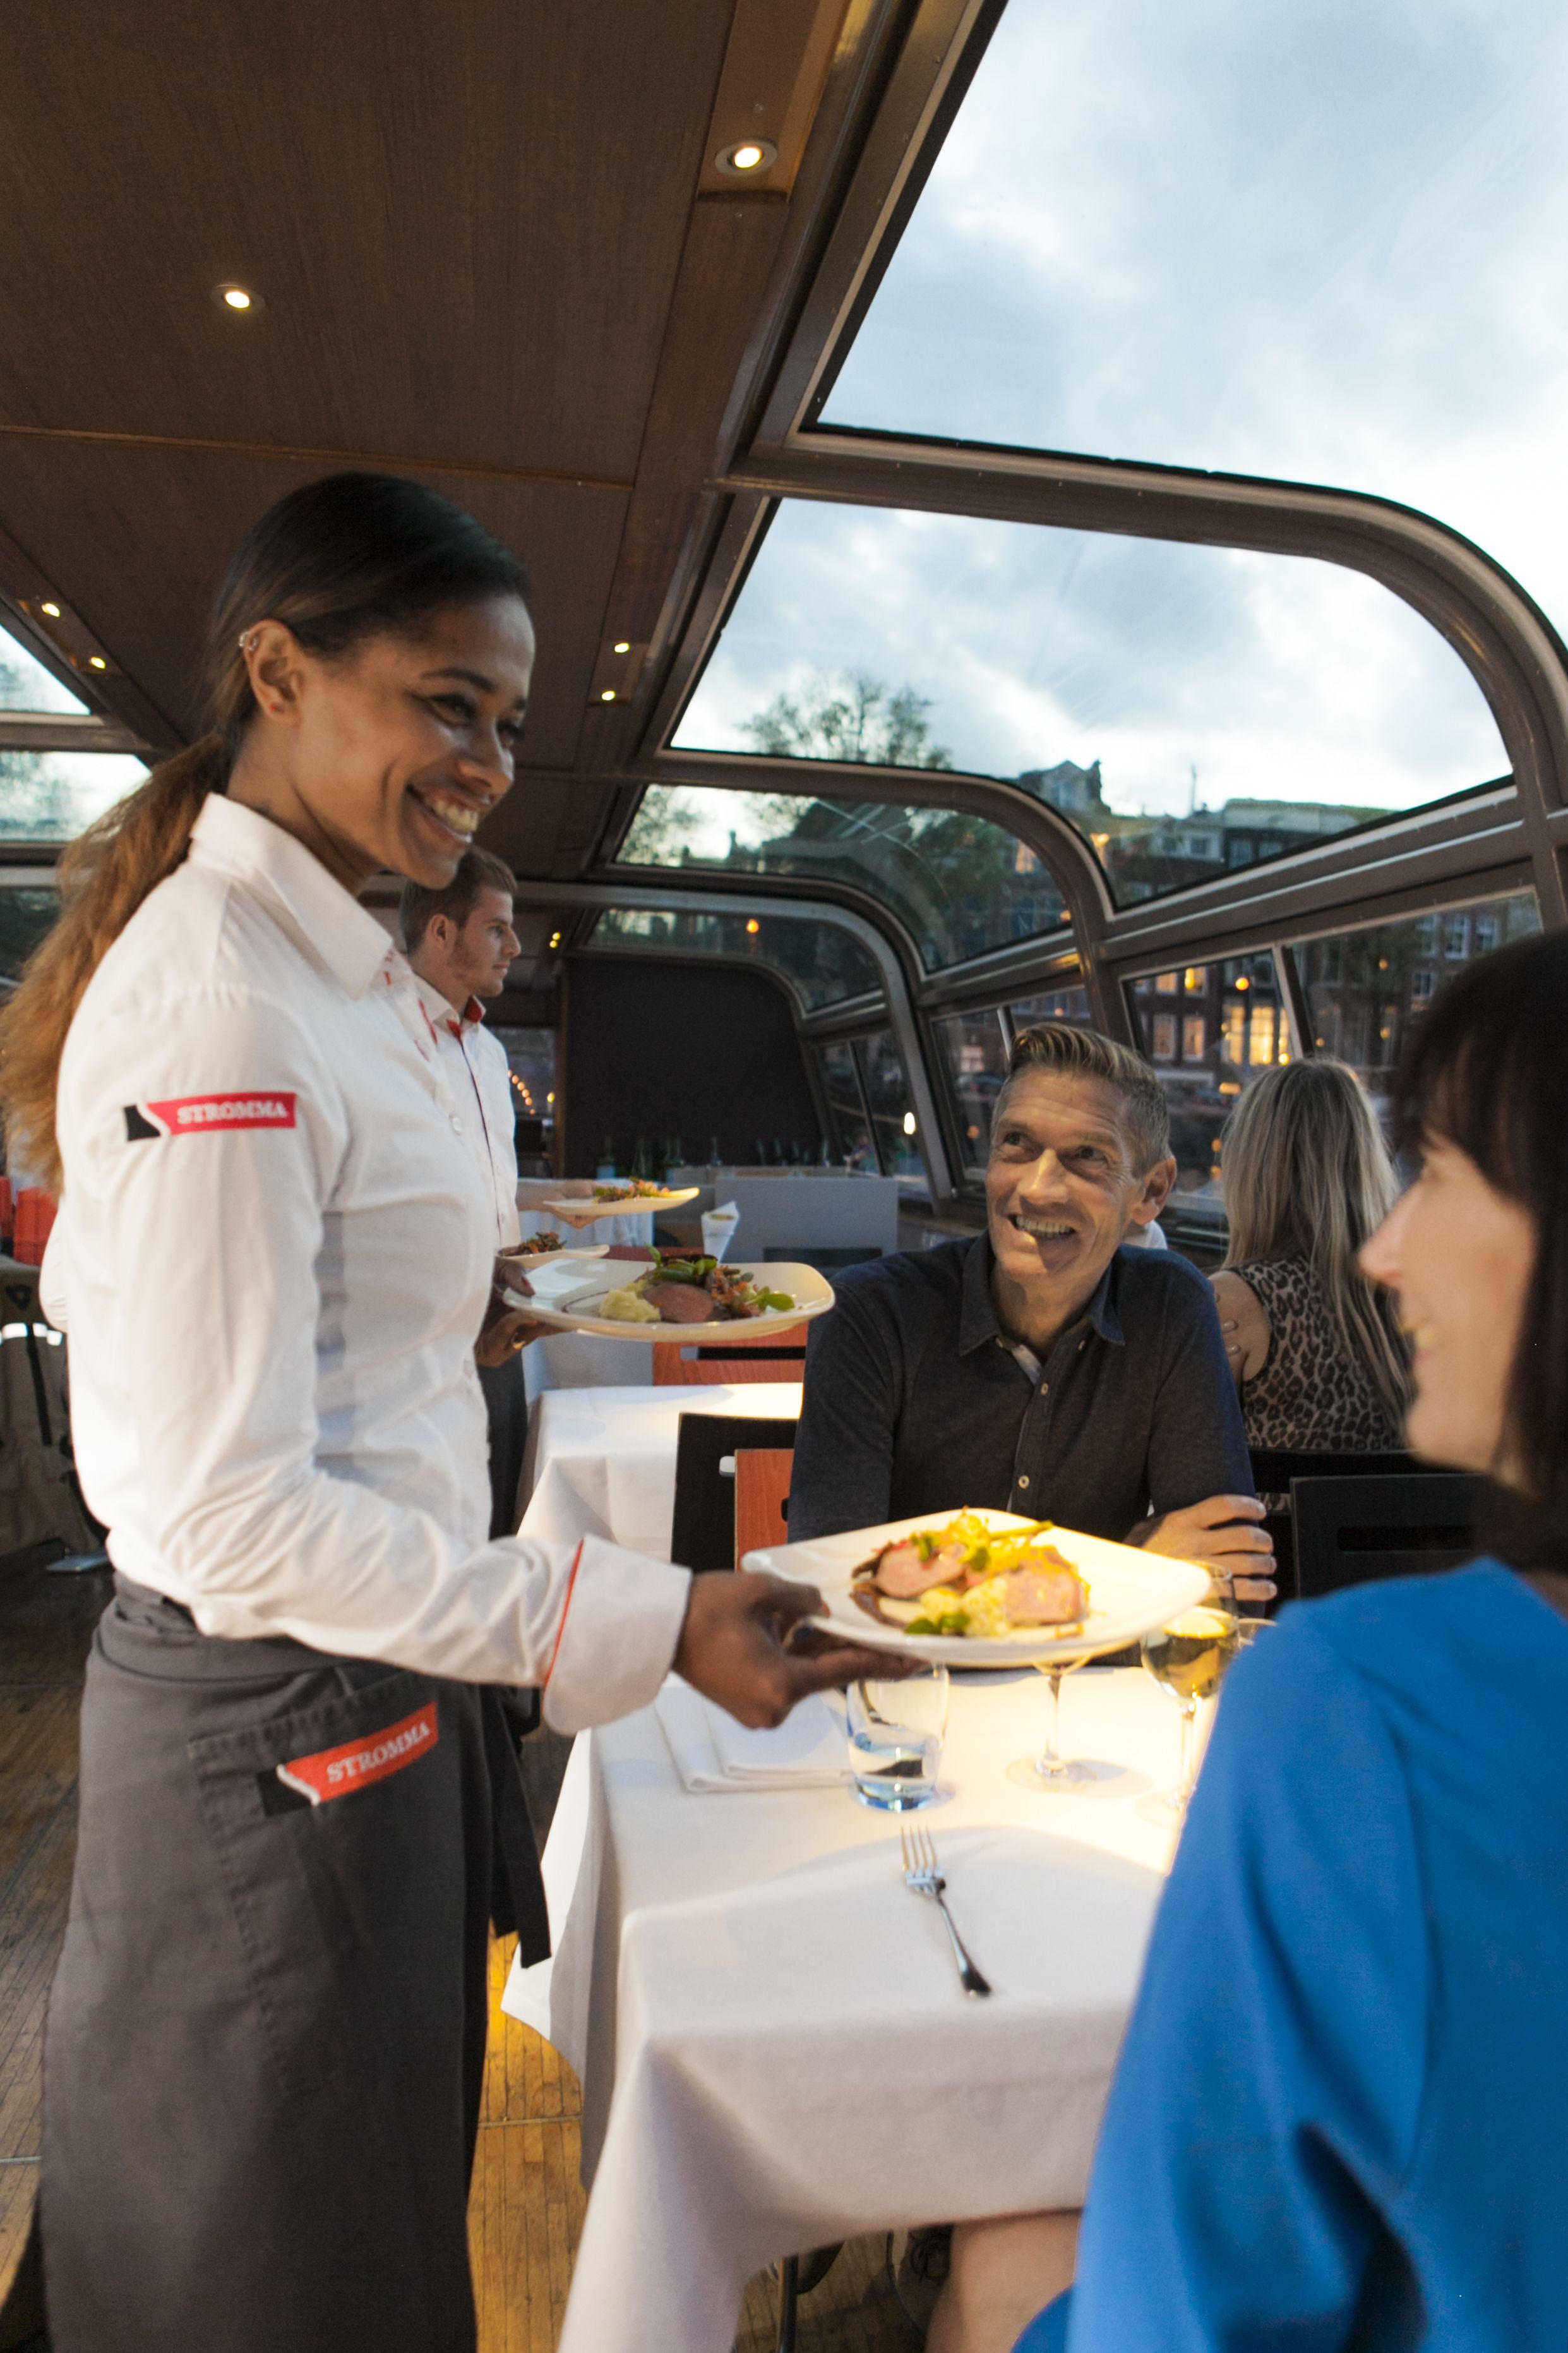 CTA Amsterdam Dinner Cruise_Serving food.jpg